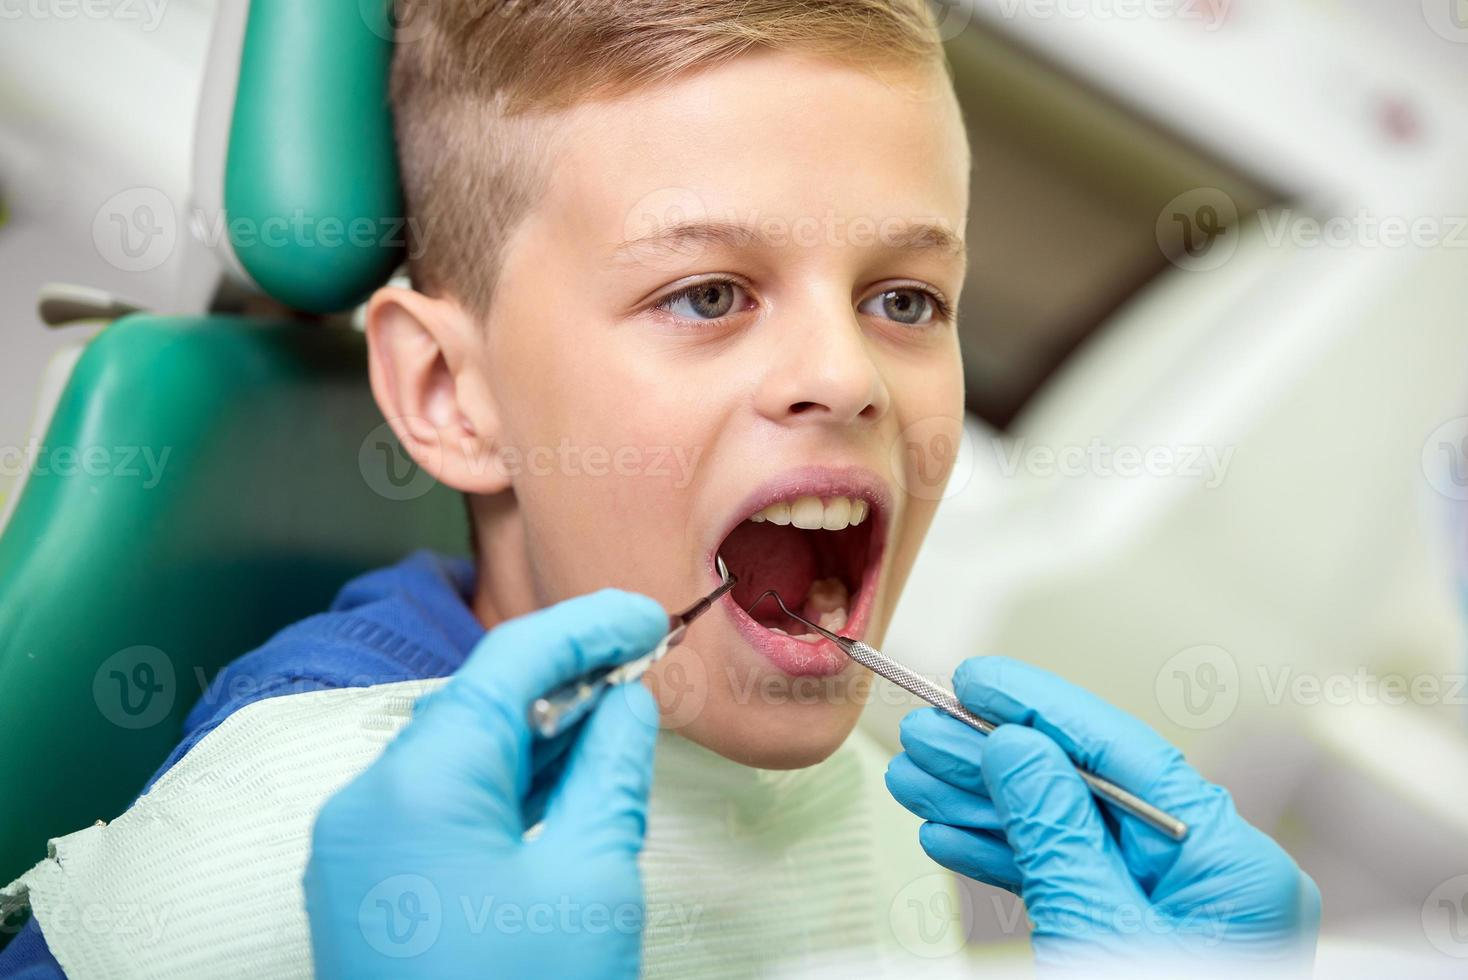 dentiste photo